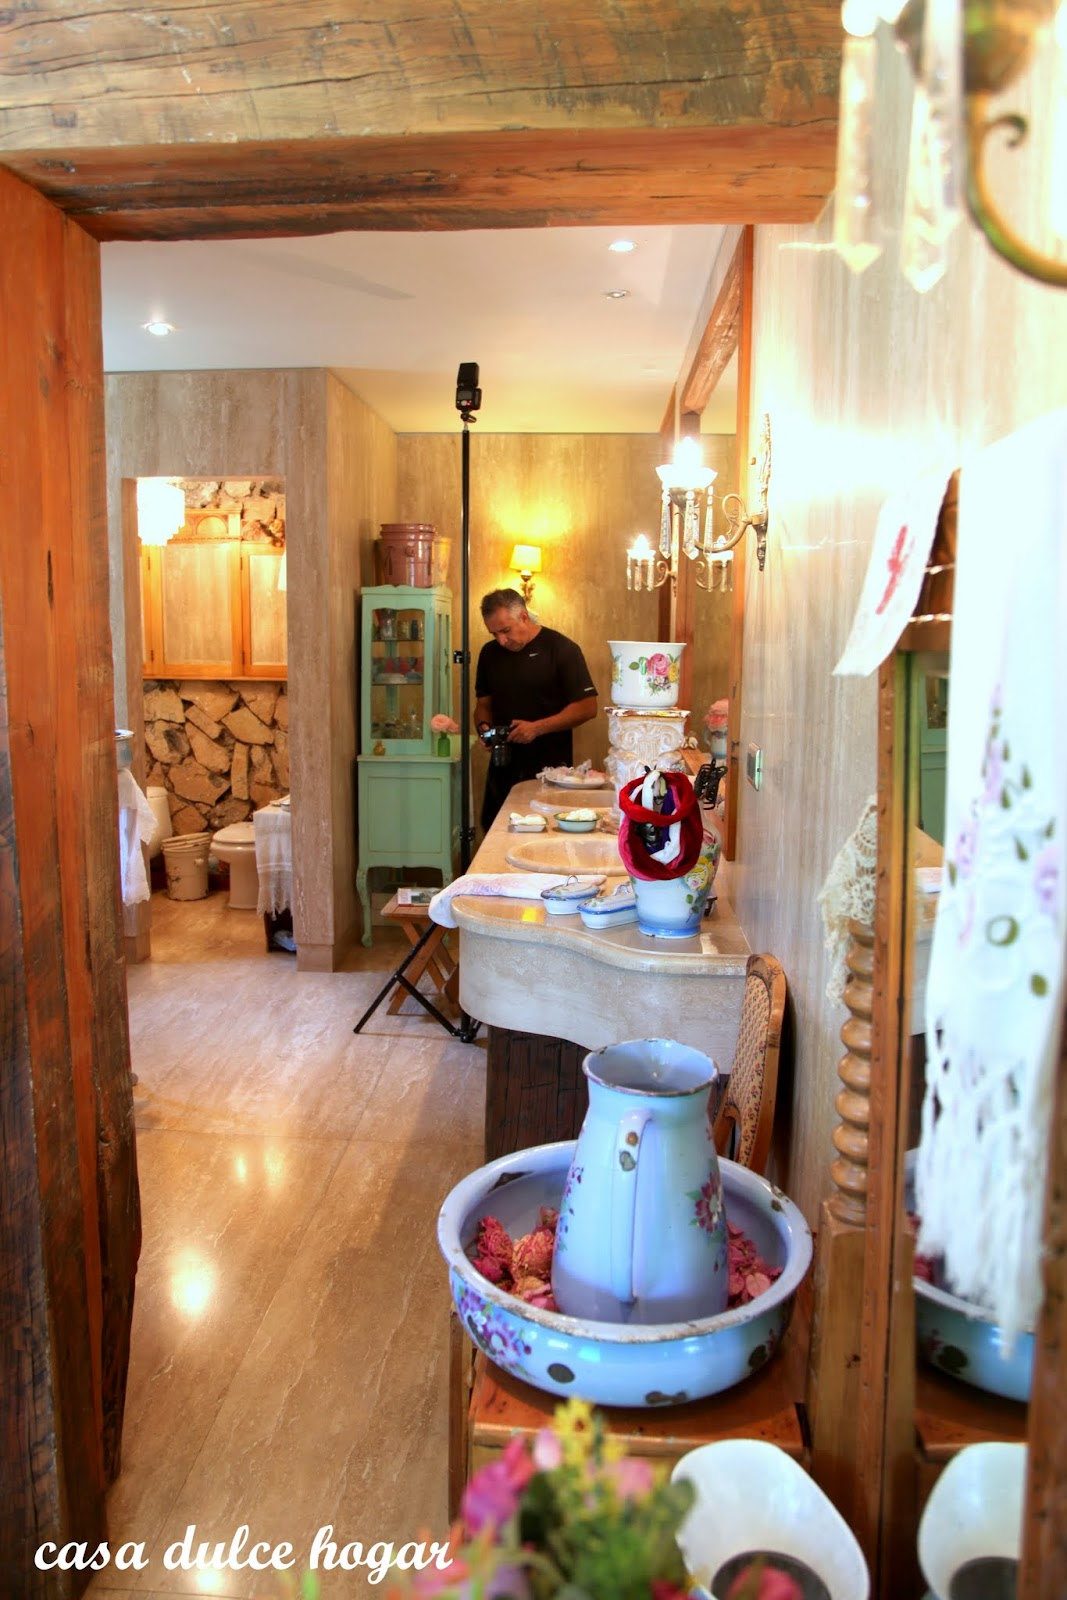 Casa dulce hogar fotos de mi casa para la revista de for Revistas de decoracion de casas